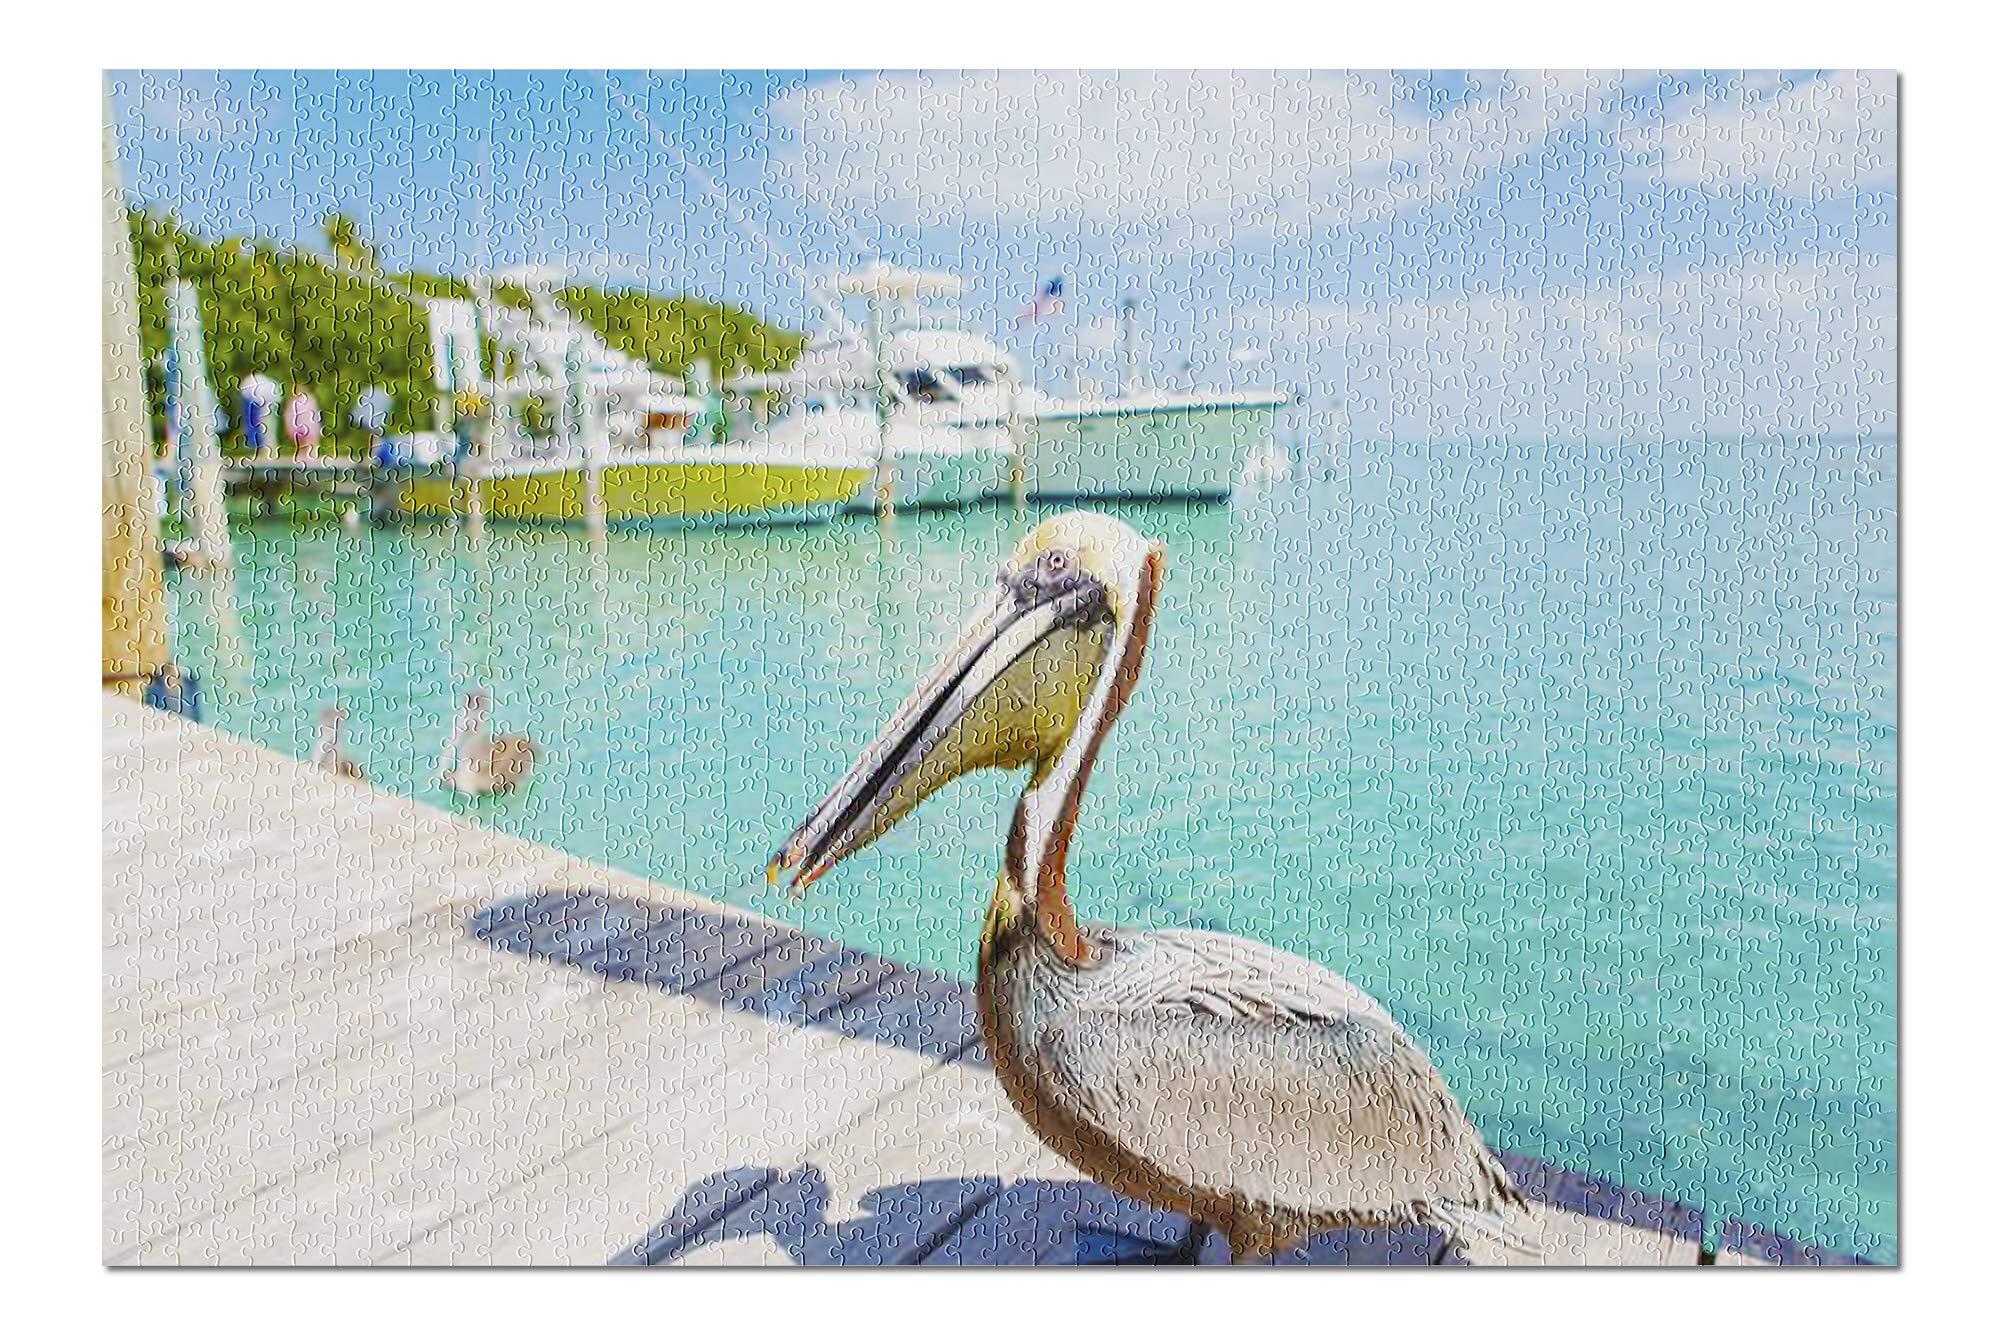 Big Brown Pelicans in Islamorada, Florida Keys 9021304 (Premium 1000 Piece Jigsaw Puzzle for Adults, 19x27, Made in USA!)